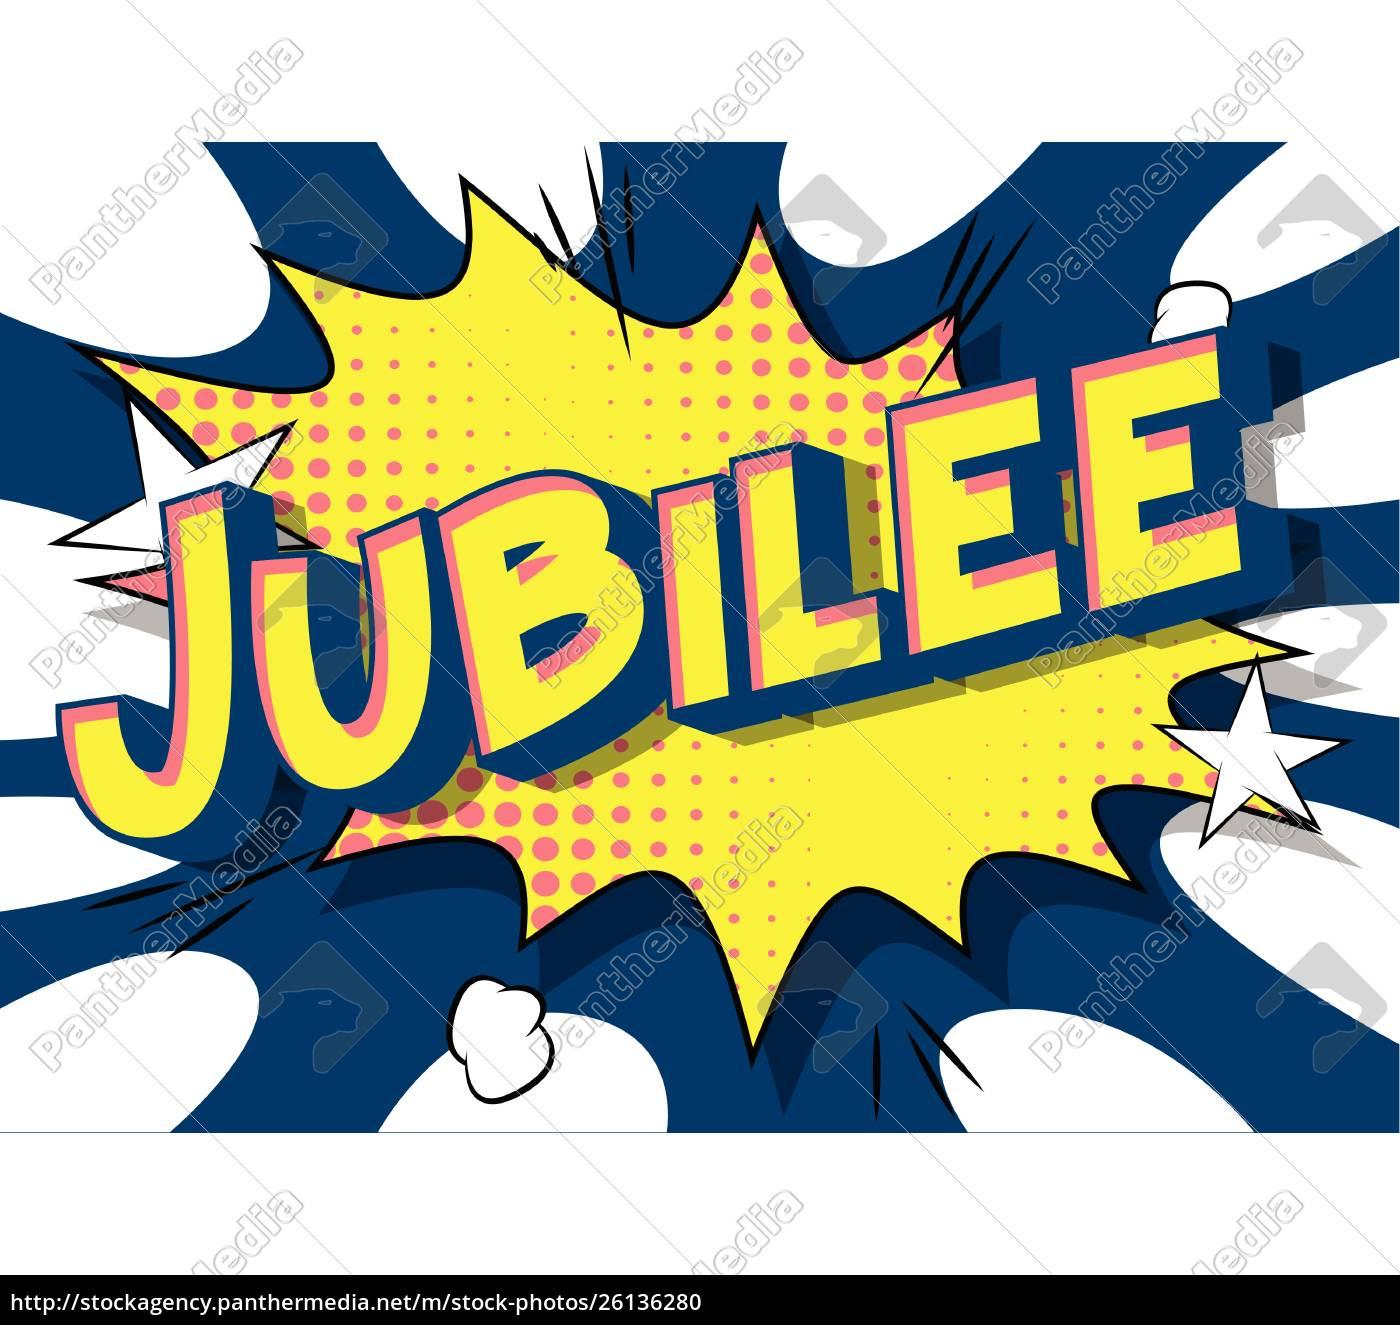 jubilee, -, comic, book, style, words. - 26136280